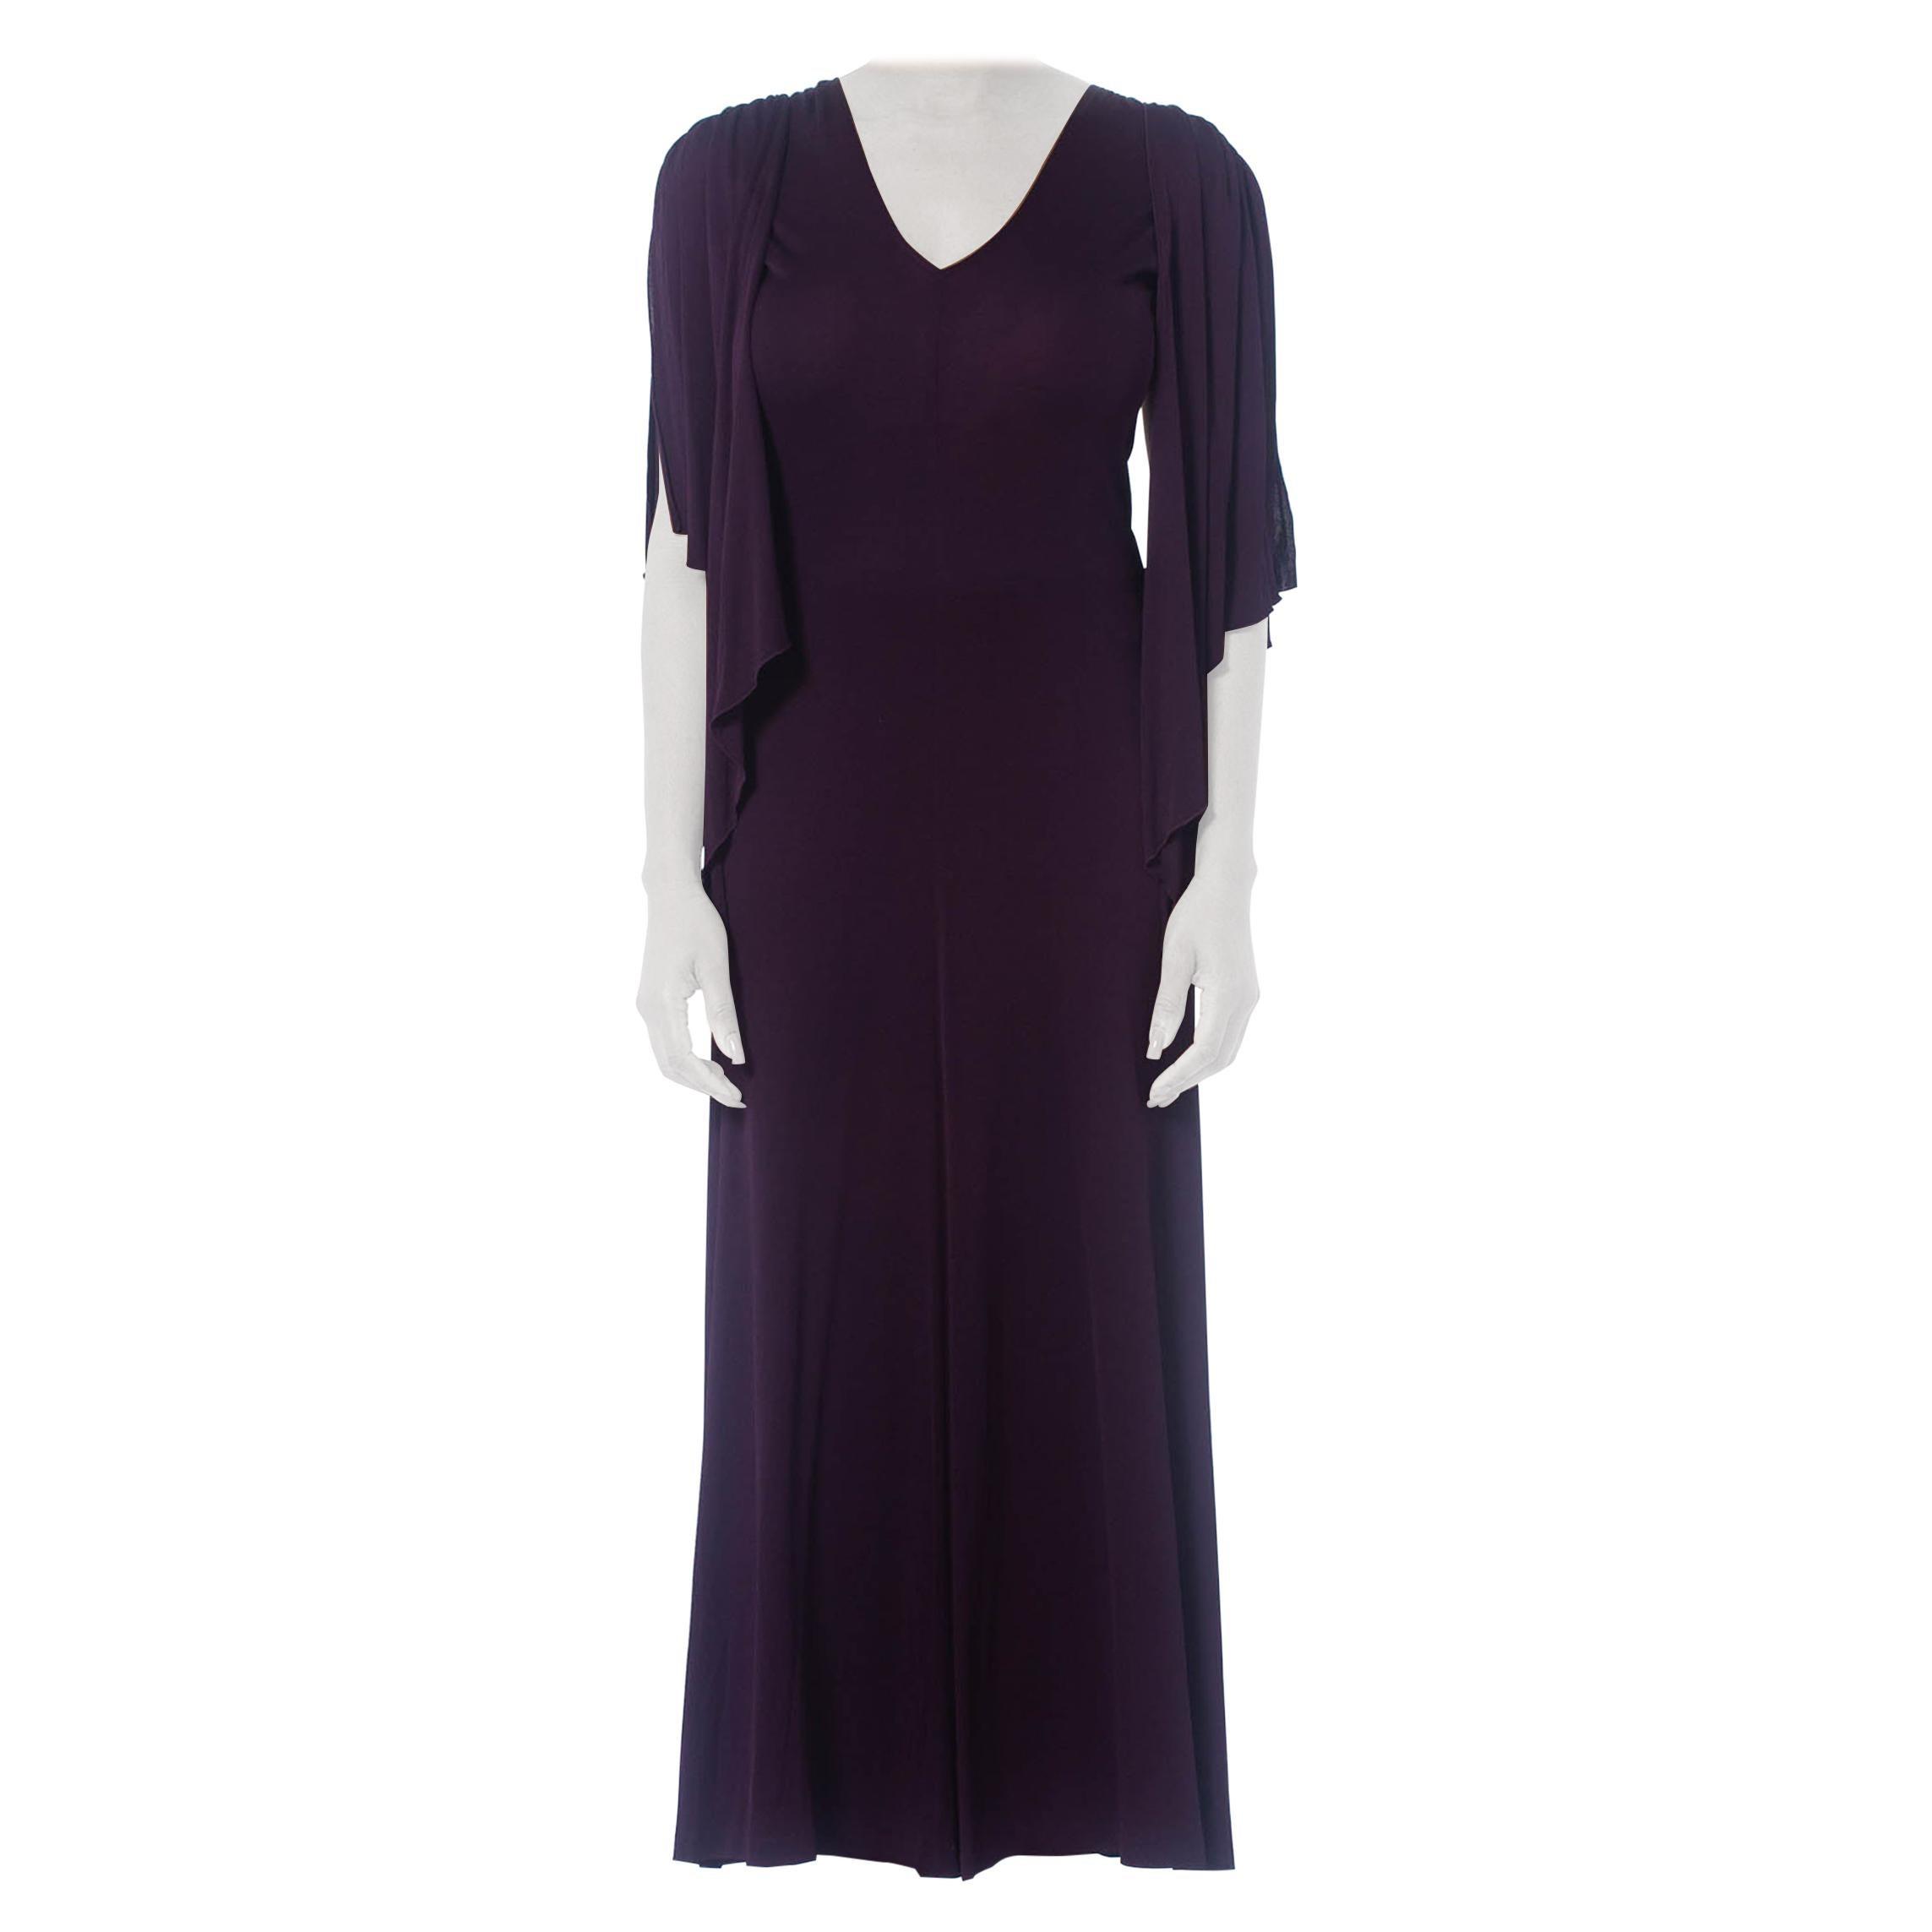 1970S SCOTT BARRIE Eggplant Purple Rayon Jersey Disco Dress